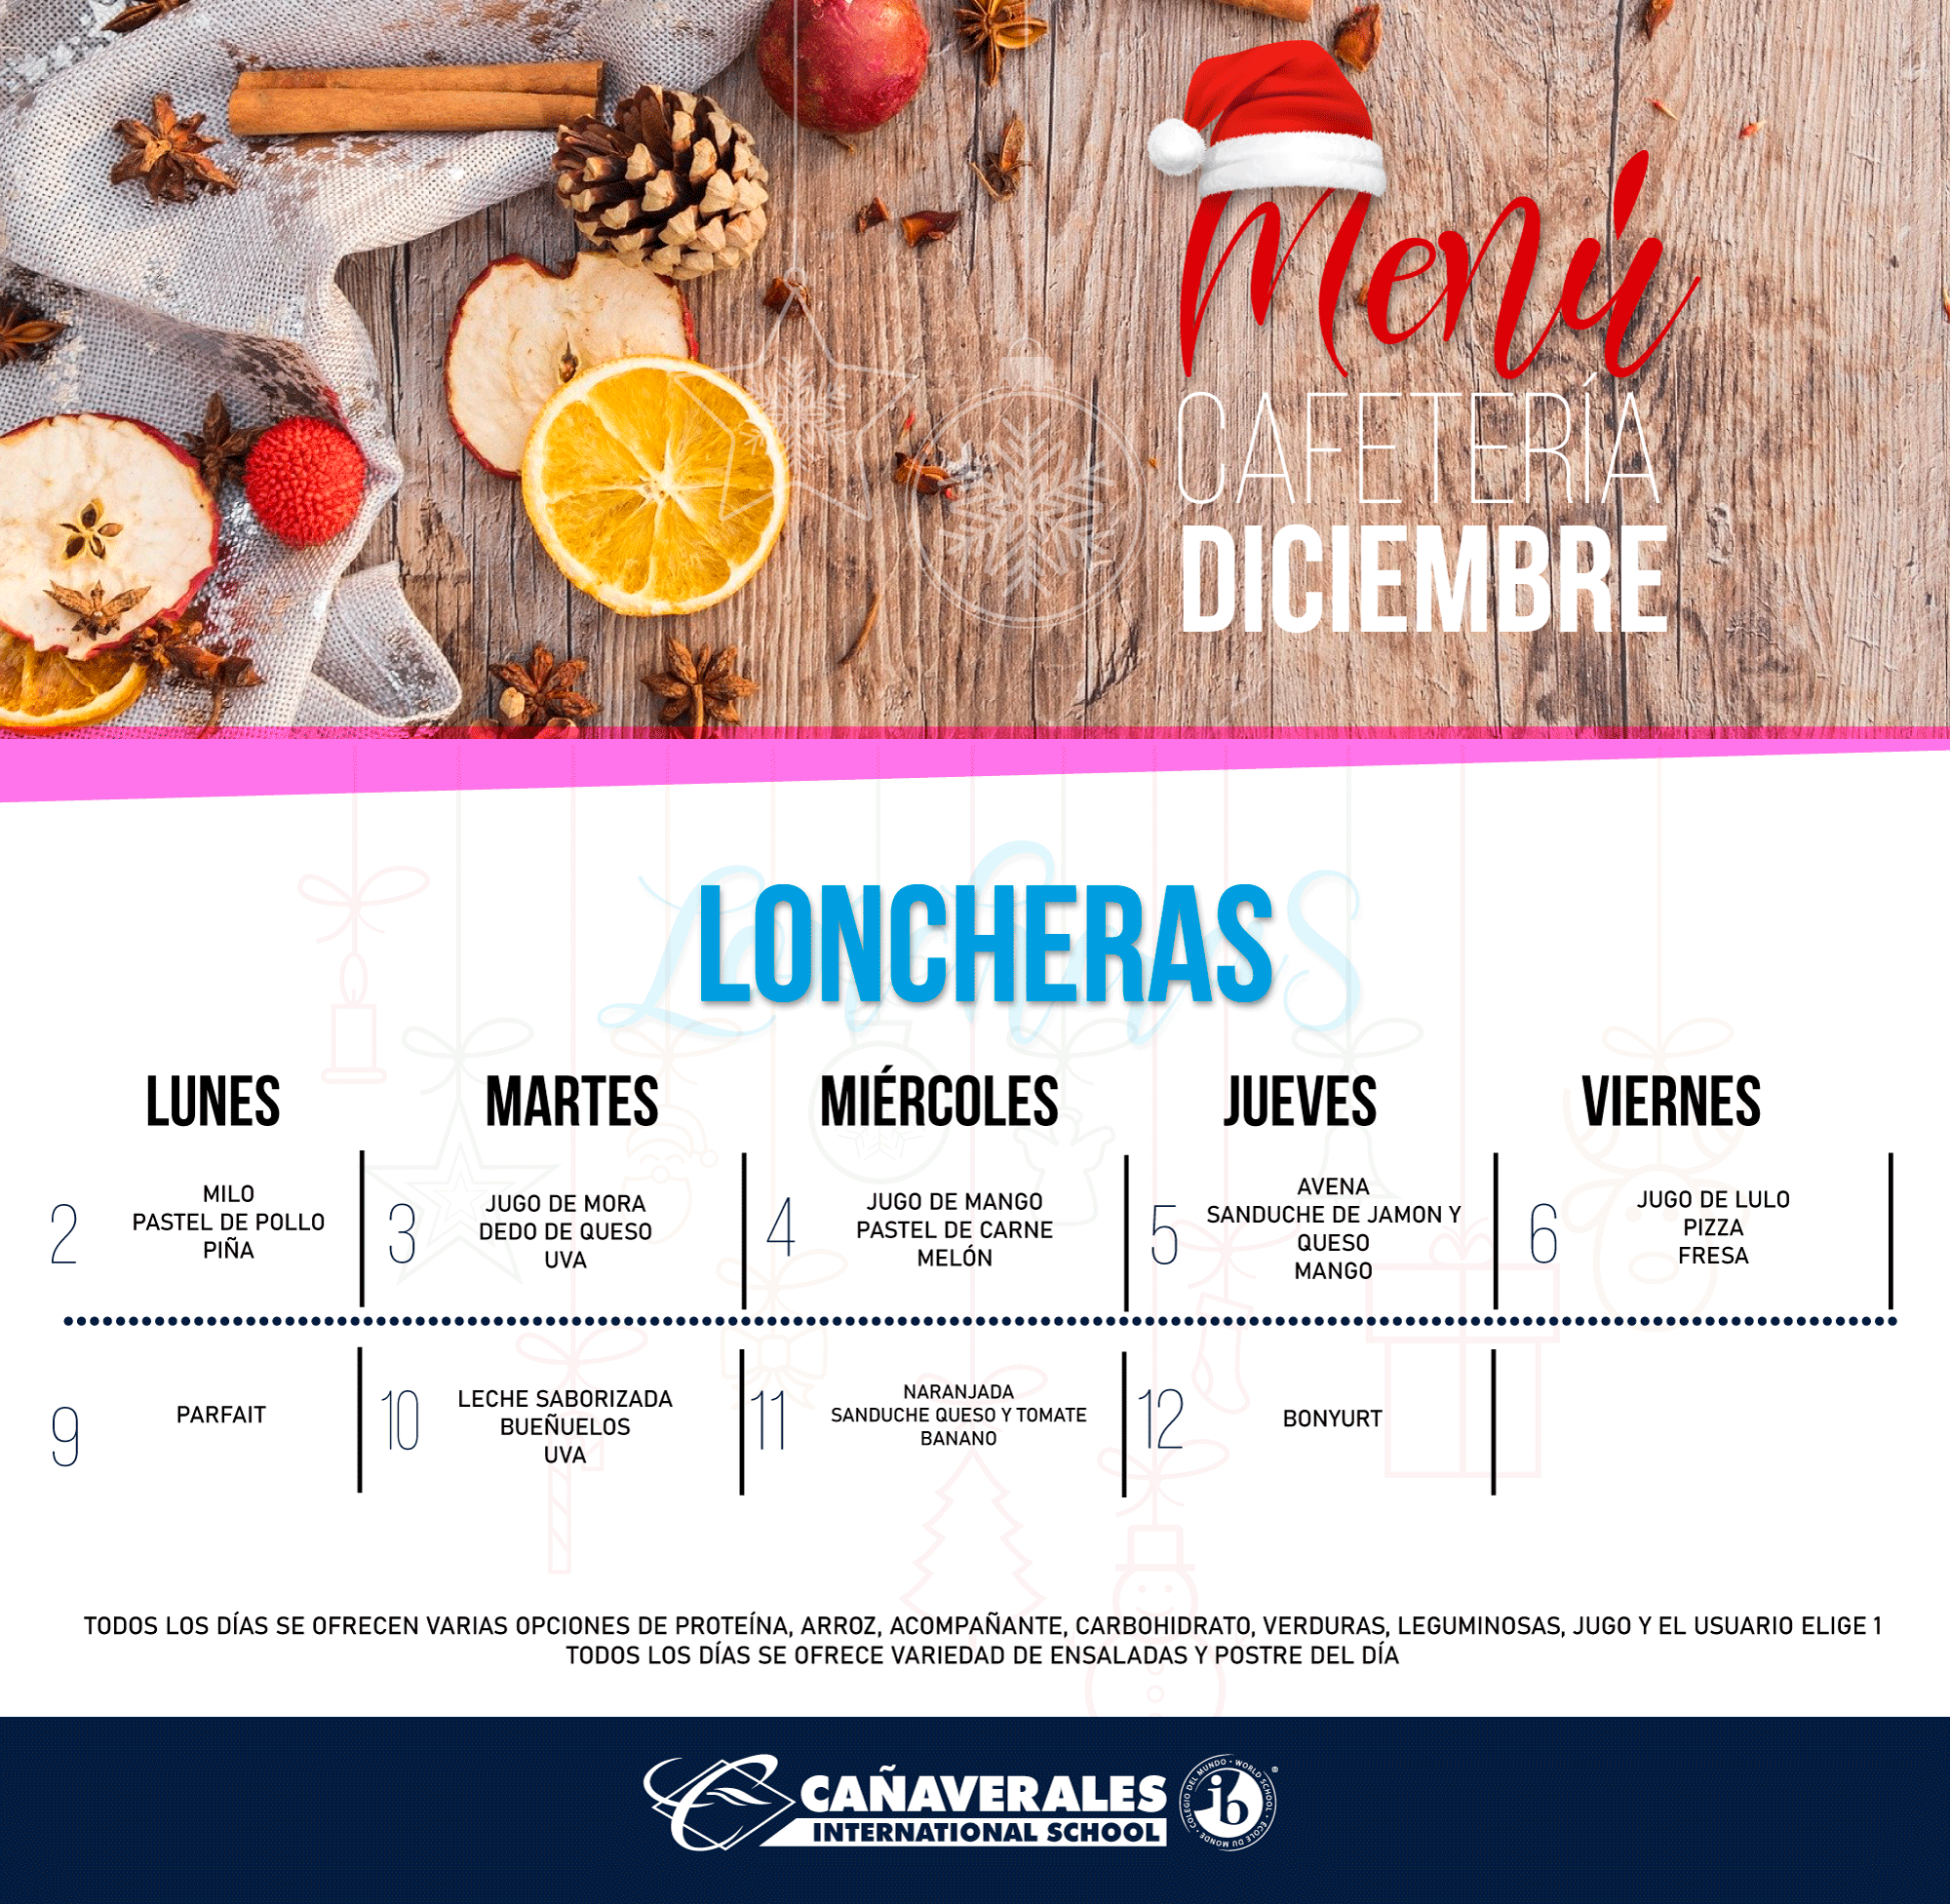 Img_cafeteria_diciembre_loncheras